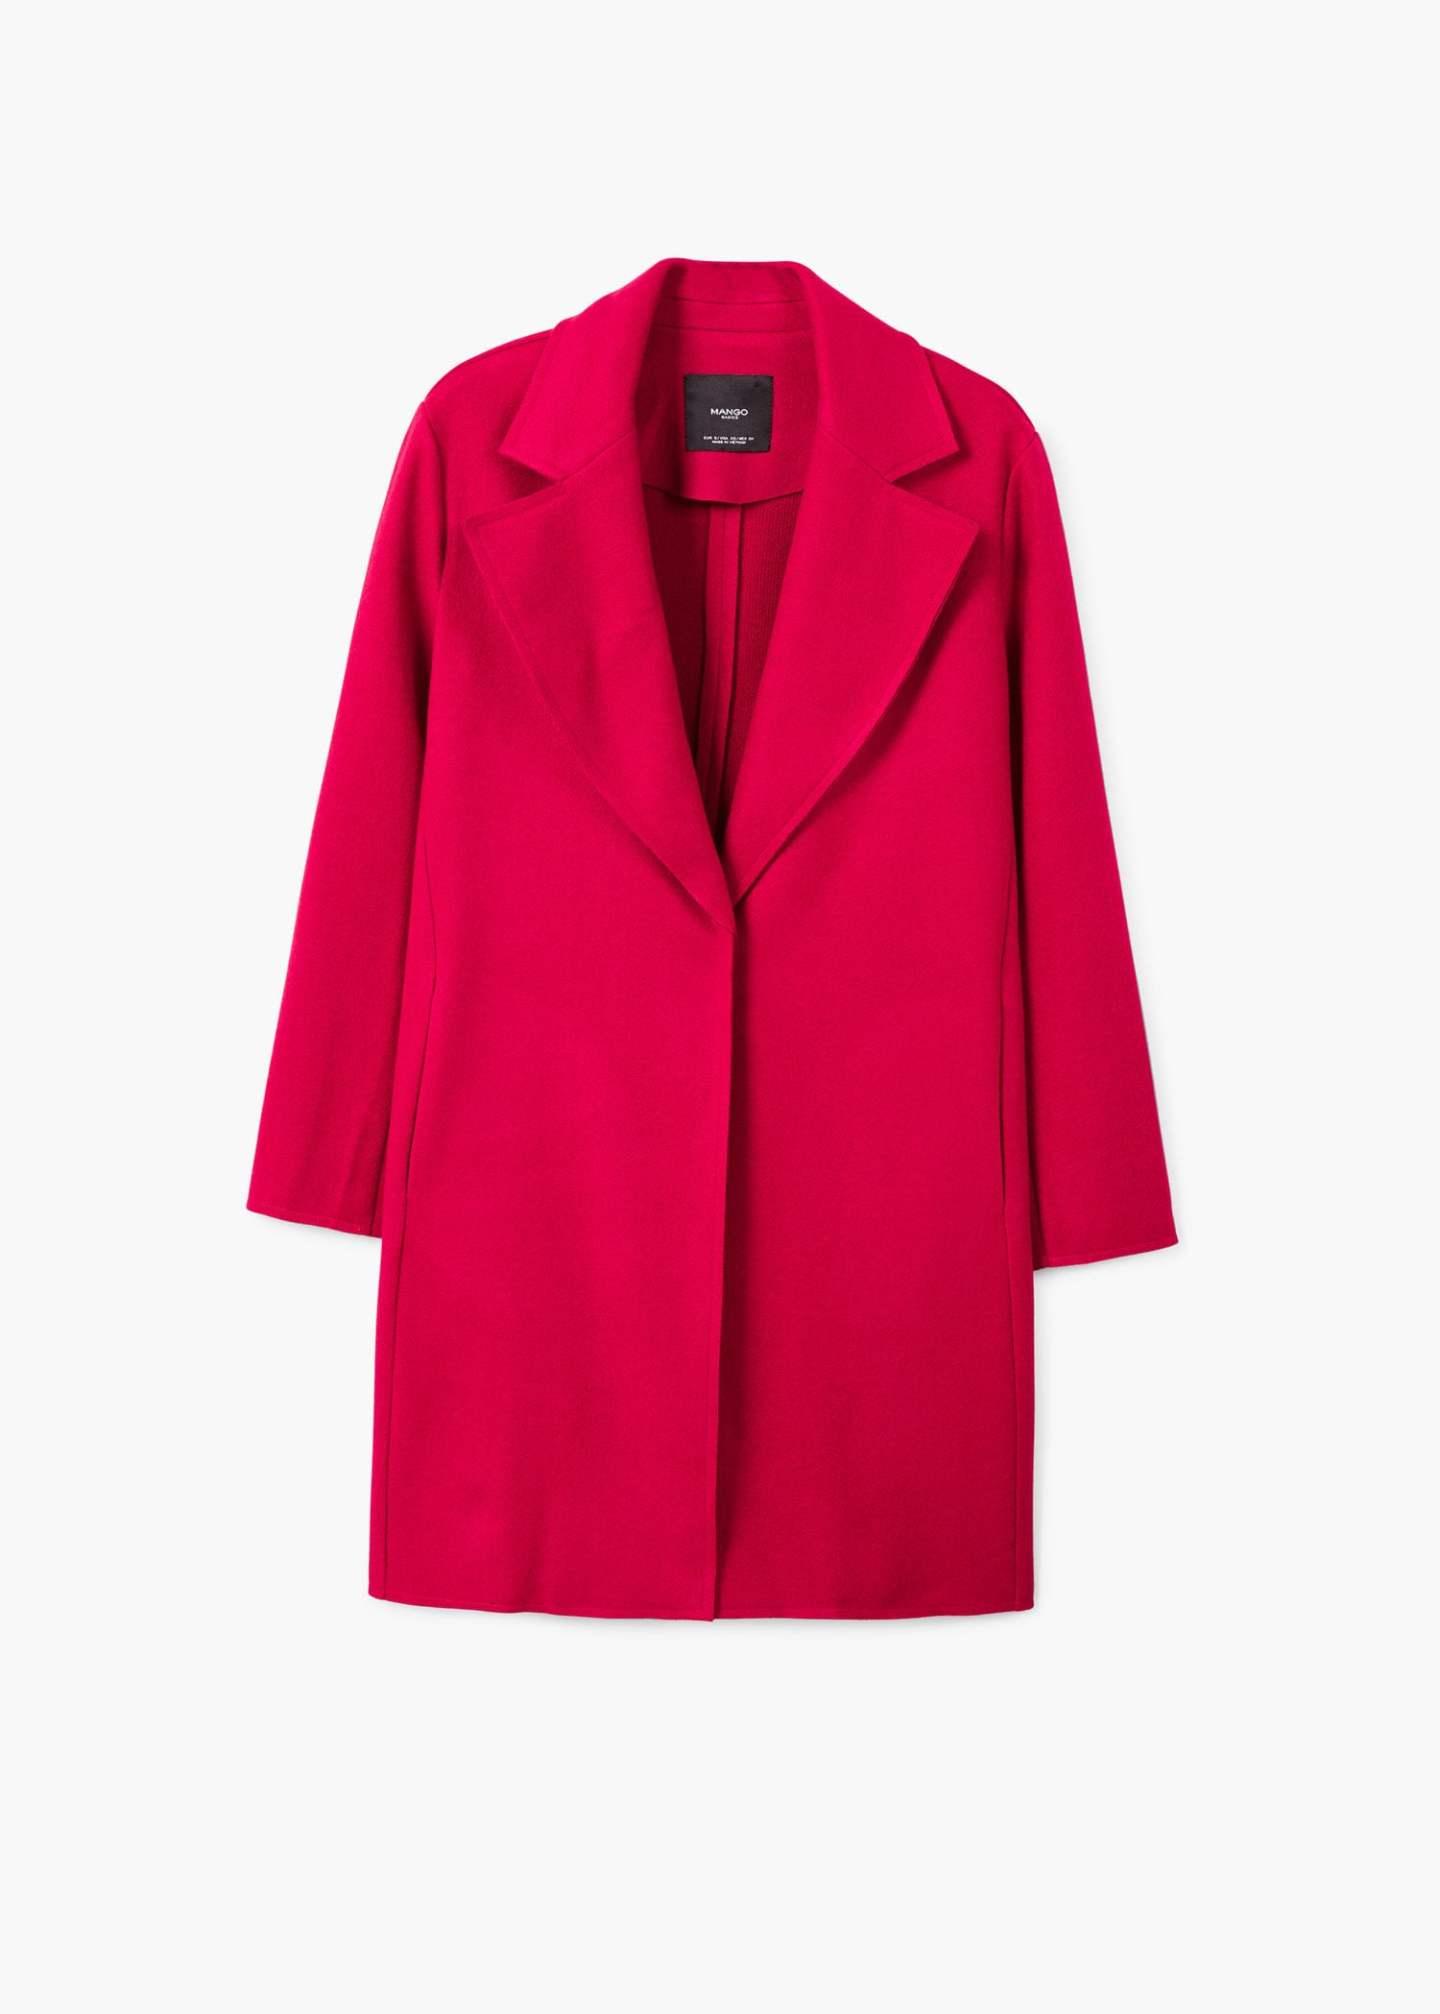 Mango darker pink coat